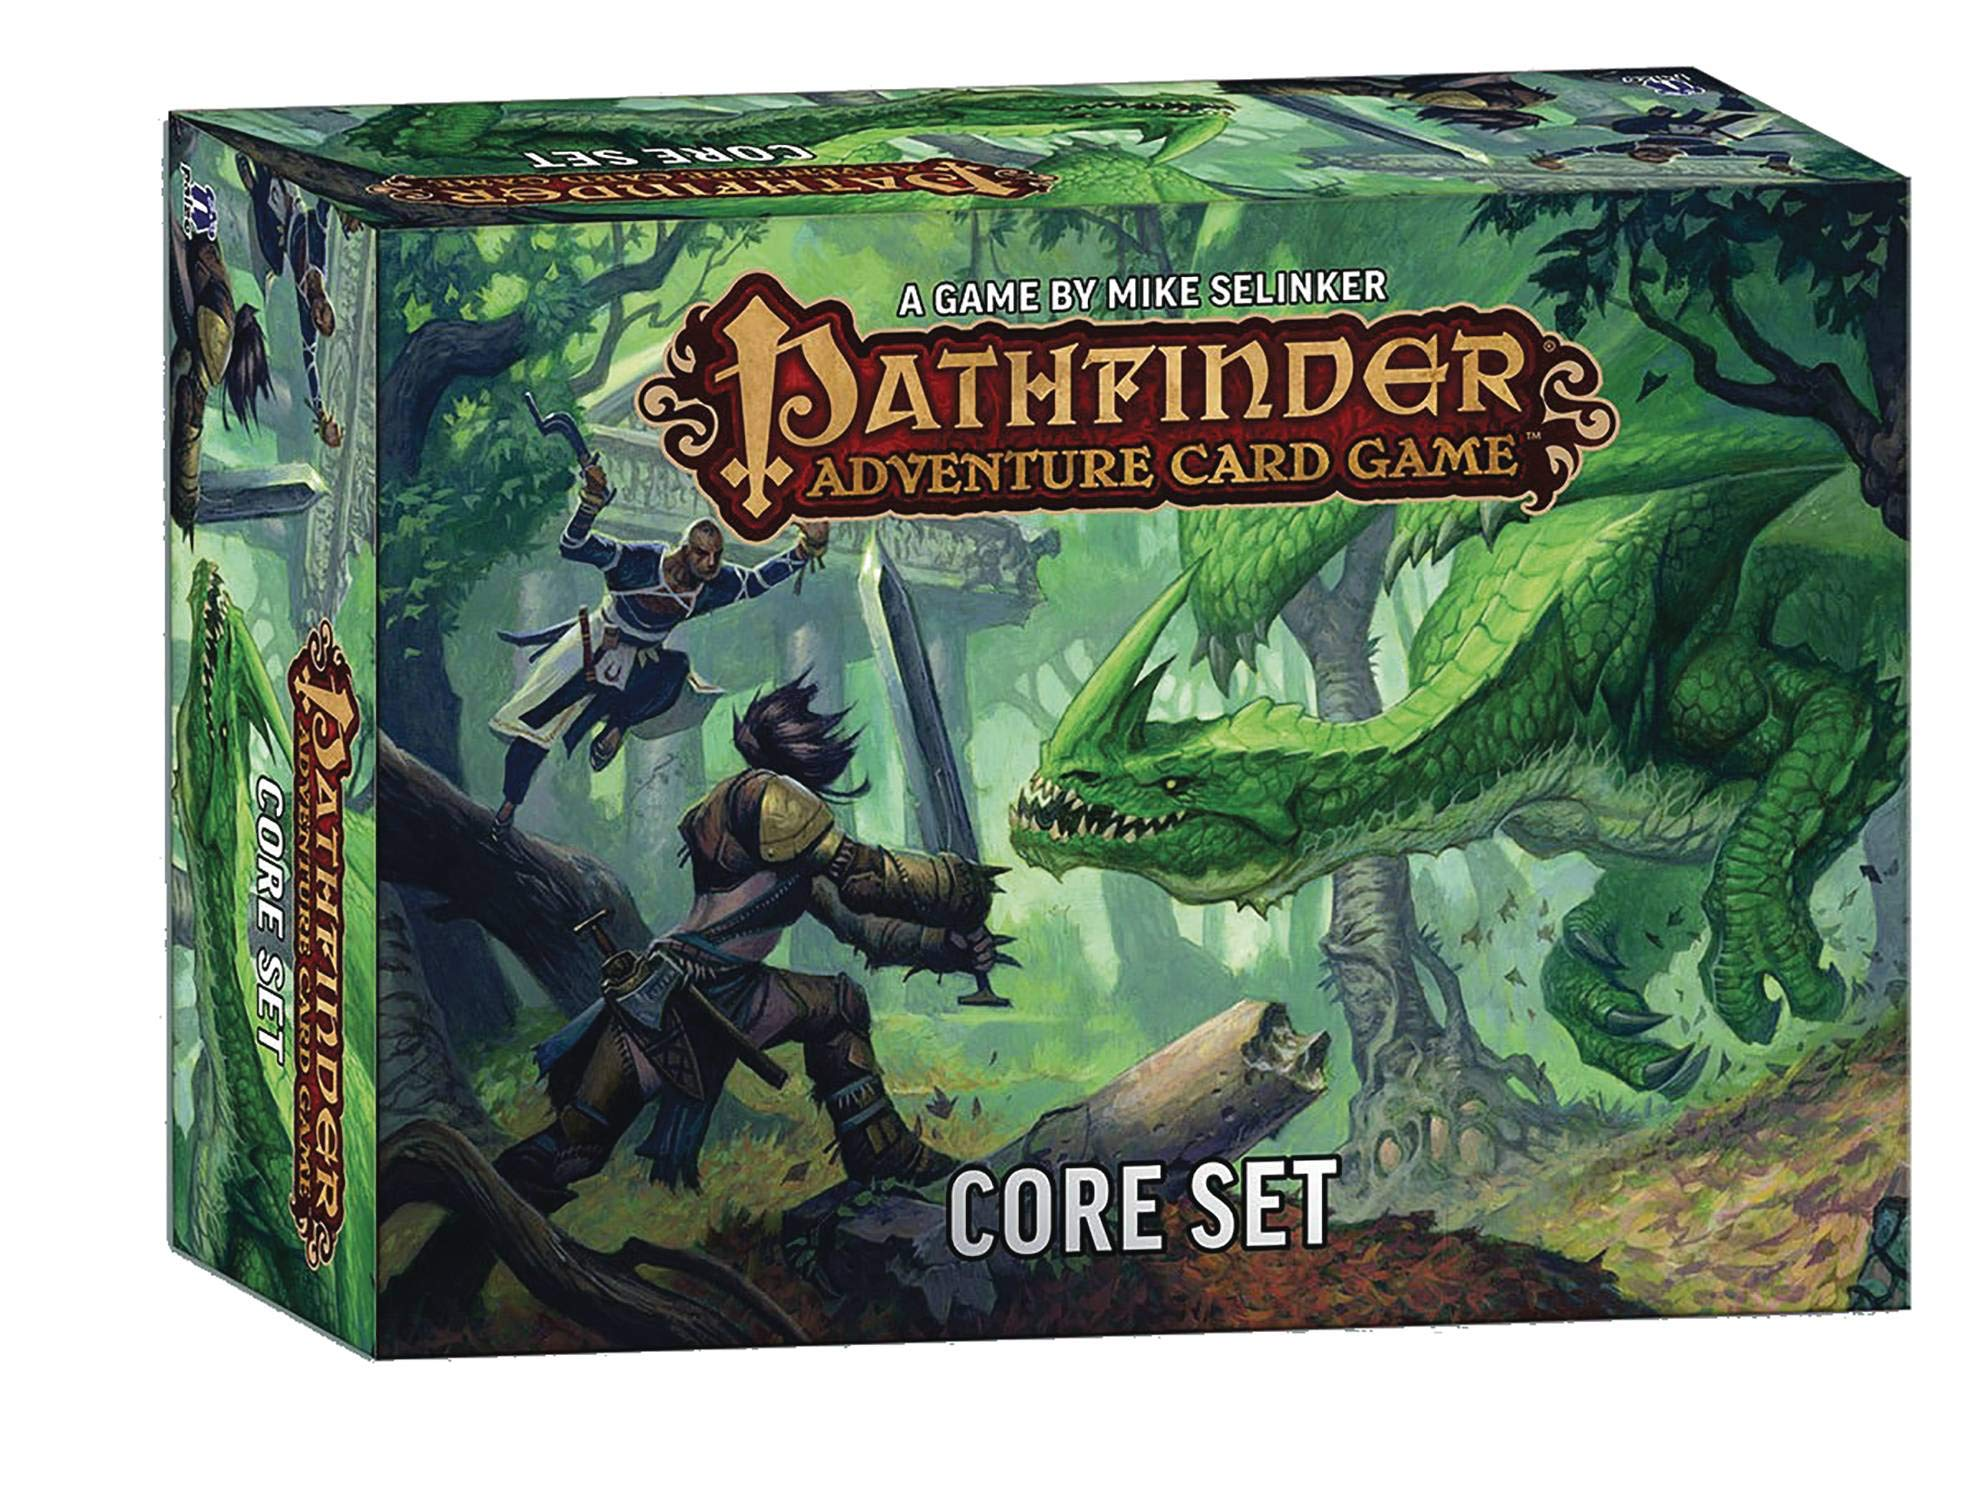 Amazon.com: Pathfinder Adventure Card Game: Core Set ...